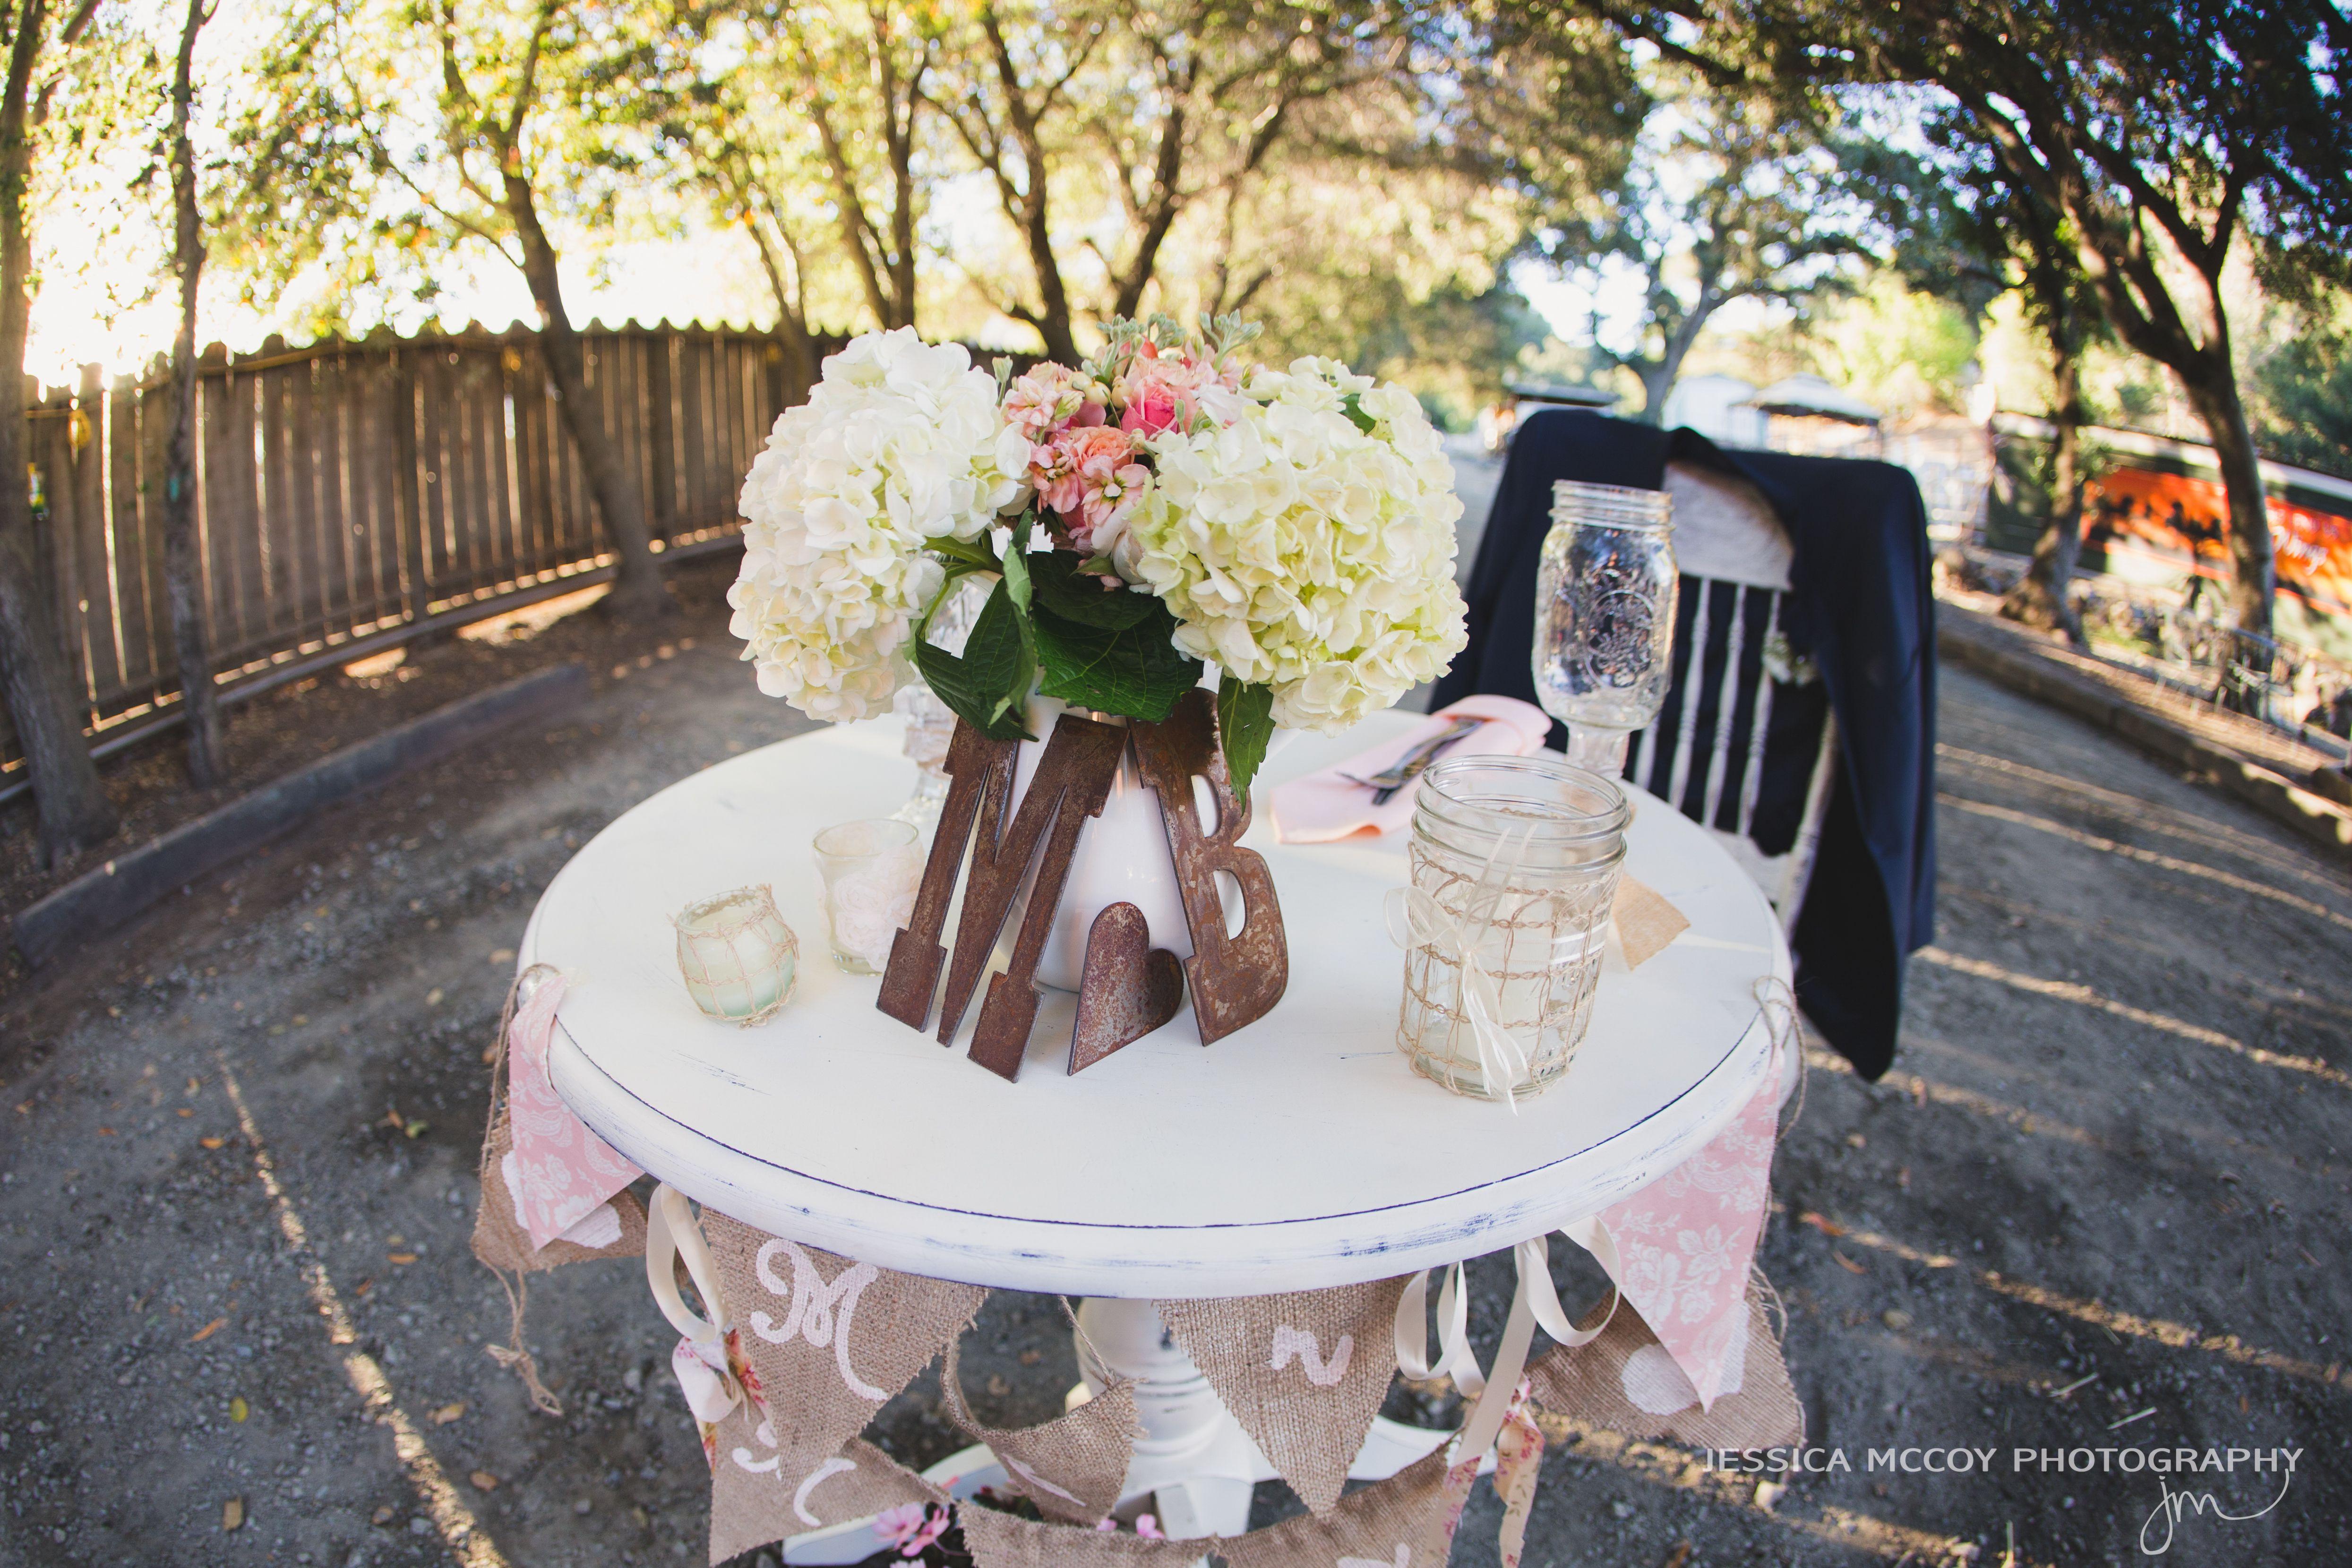 Rustic Vintage Wedding Rentals By Your Vintage Affair Rustic Vintage Wedding Wedding Rentals